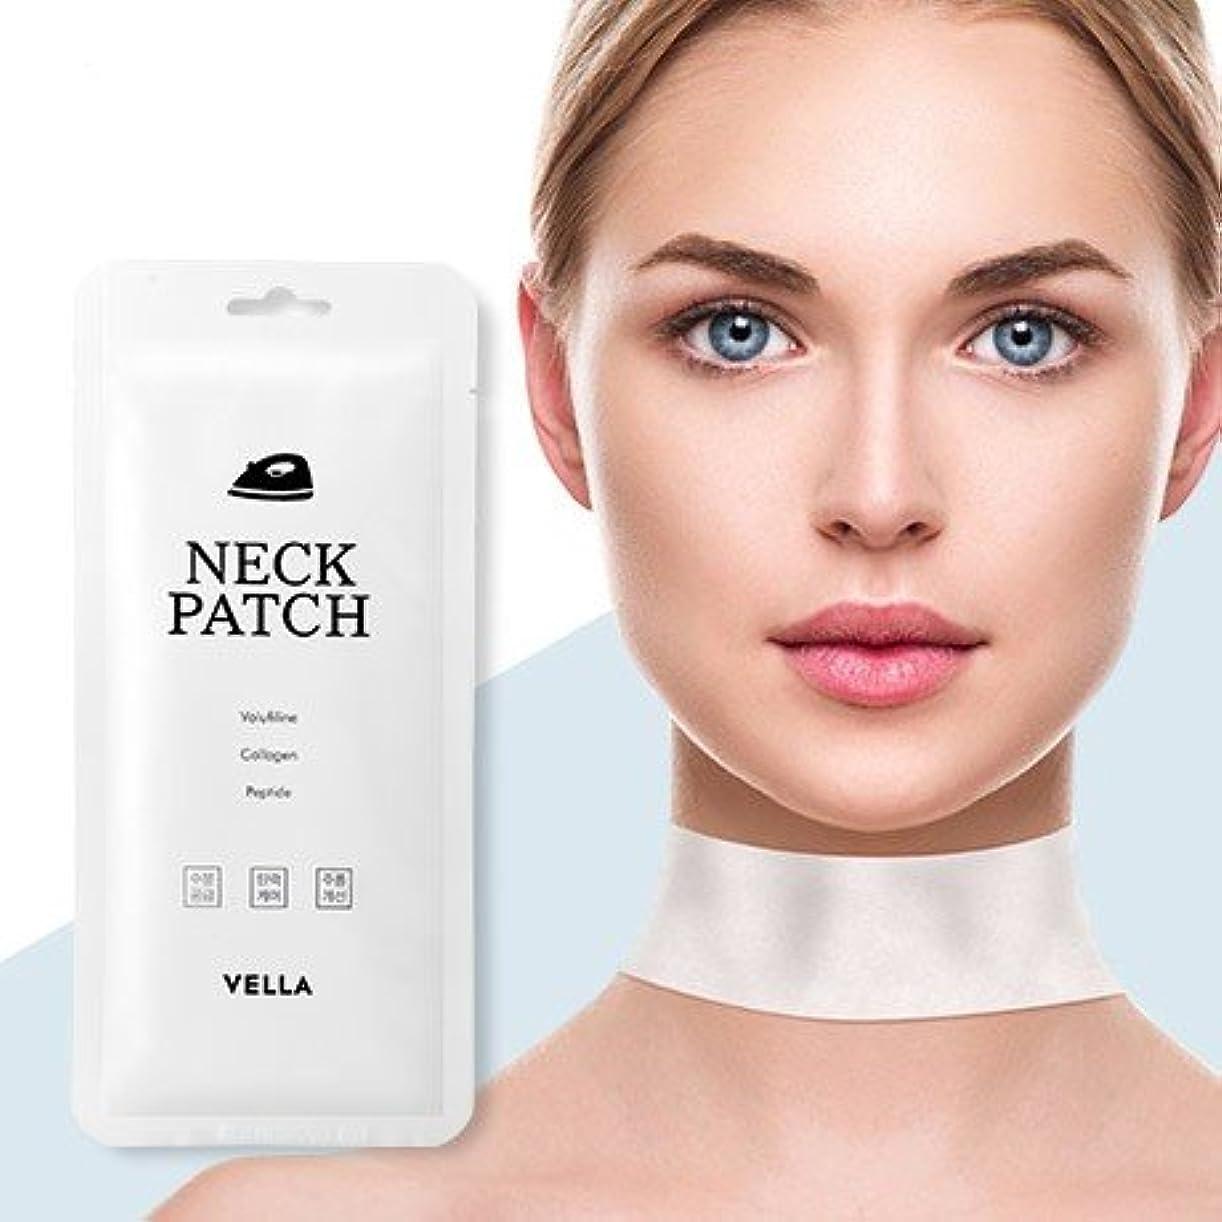 支出対称適度にVella Neck Patch 5Pcs/Neck Wrinkle Care/Korea Cosmetics